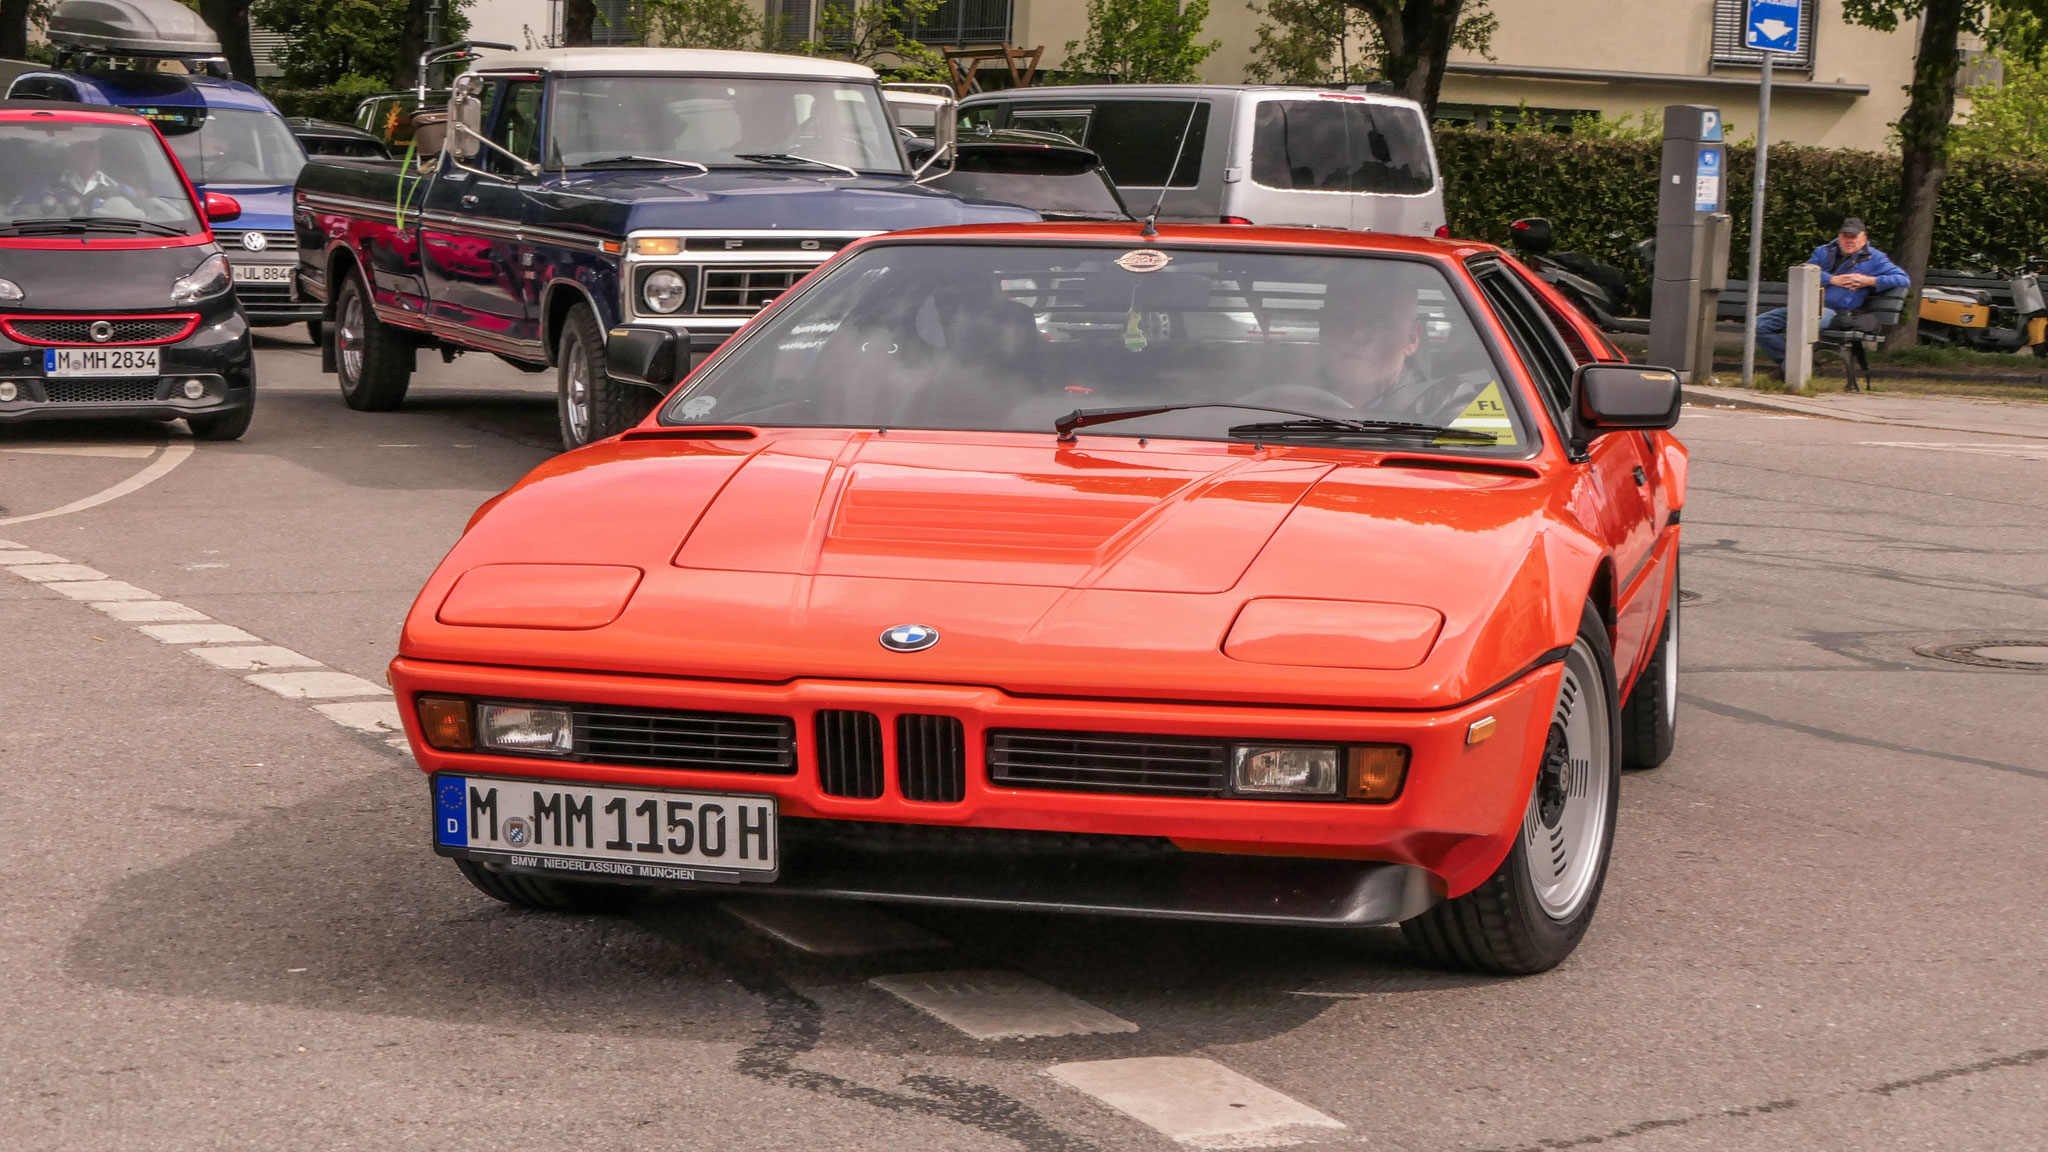 BMW M1 - M-MM-1150H